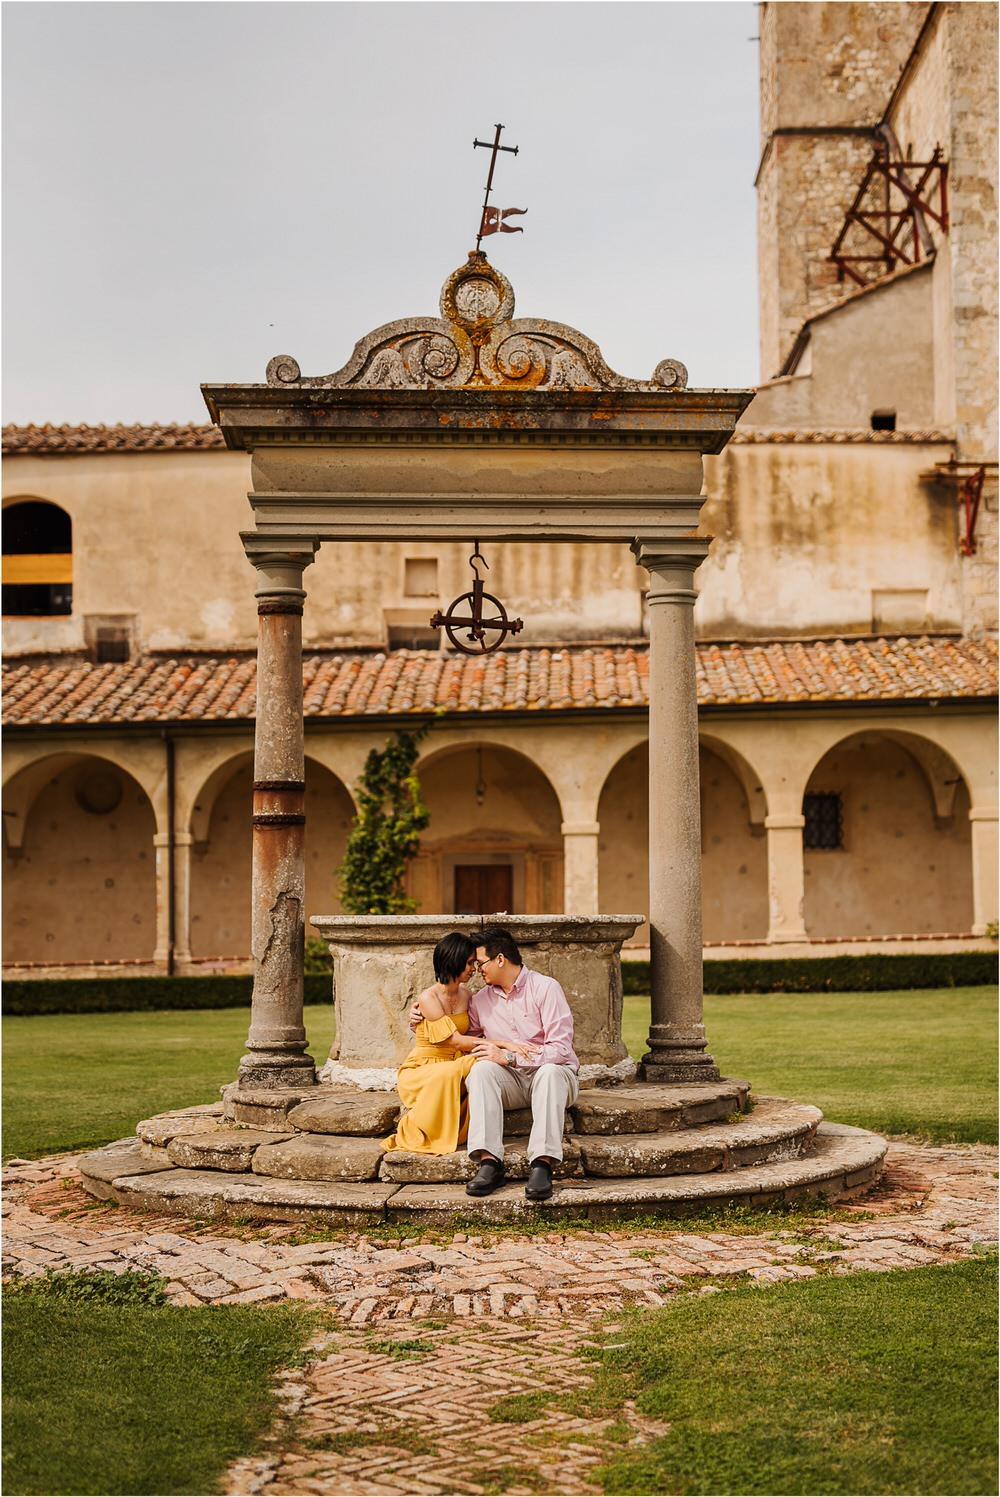 tuscany wedding photographer greece croatia dubrovnik vjencanje hochzeit wedding photography photos romantic engagement nika grega 0028.jpg